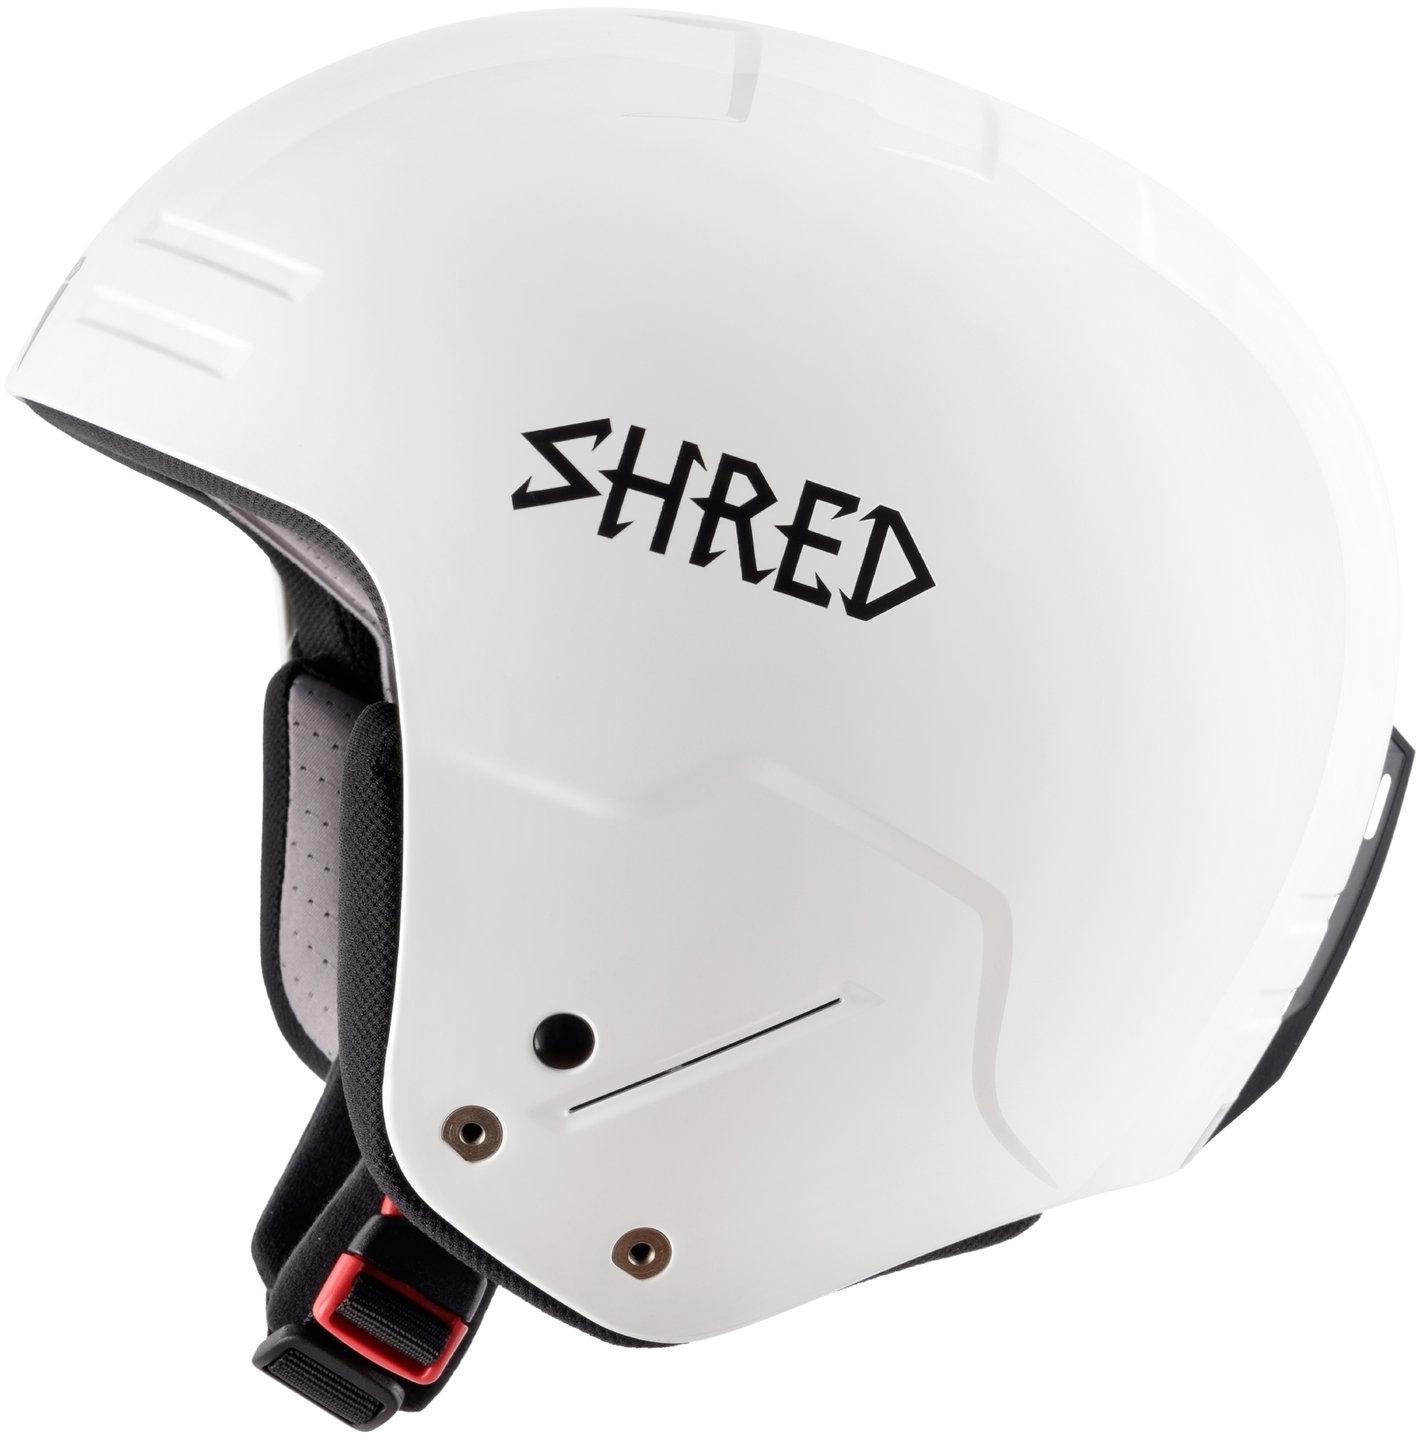 Shred Basher Whiteout S